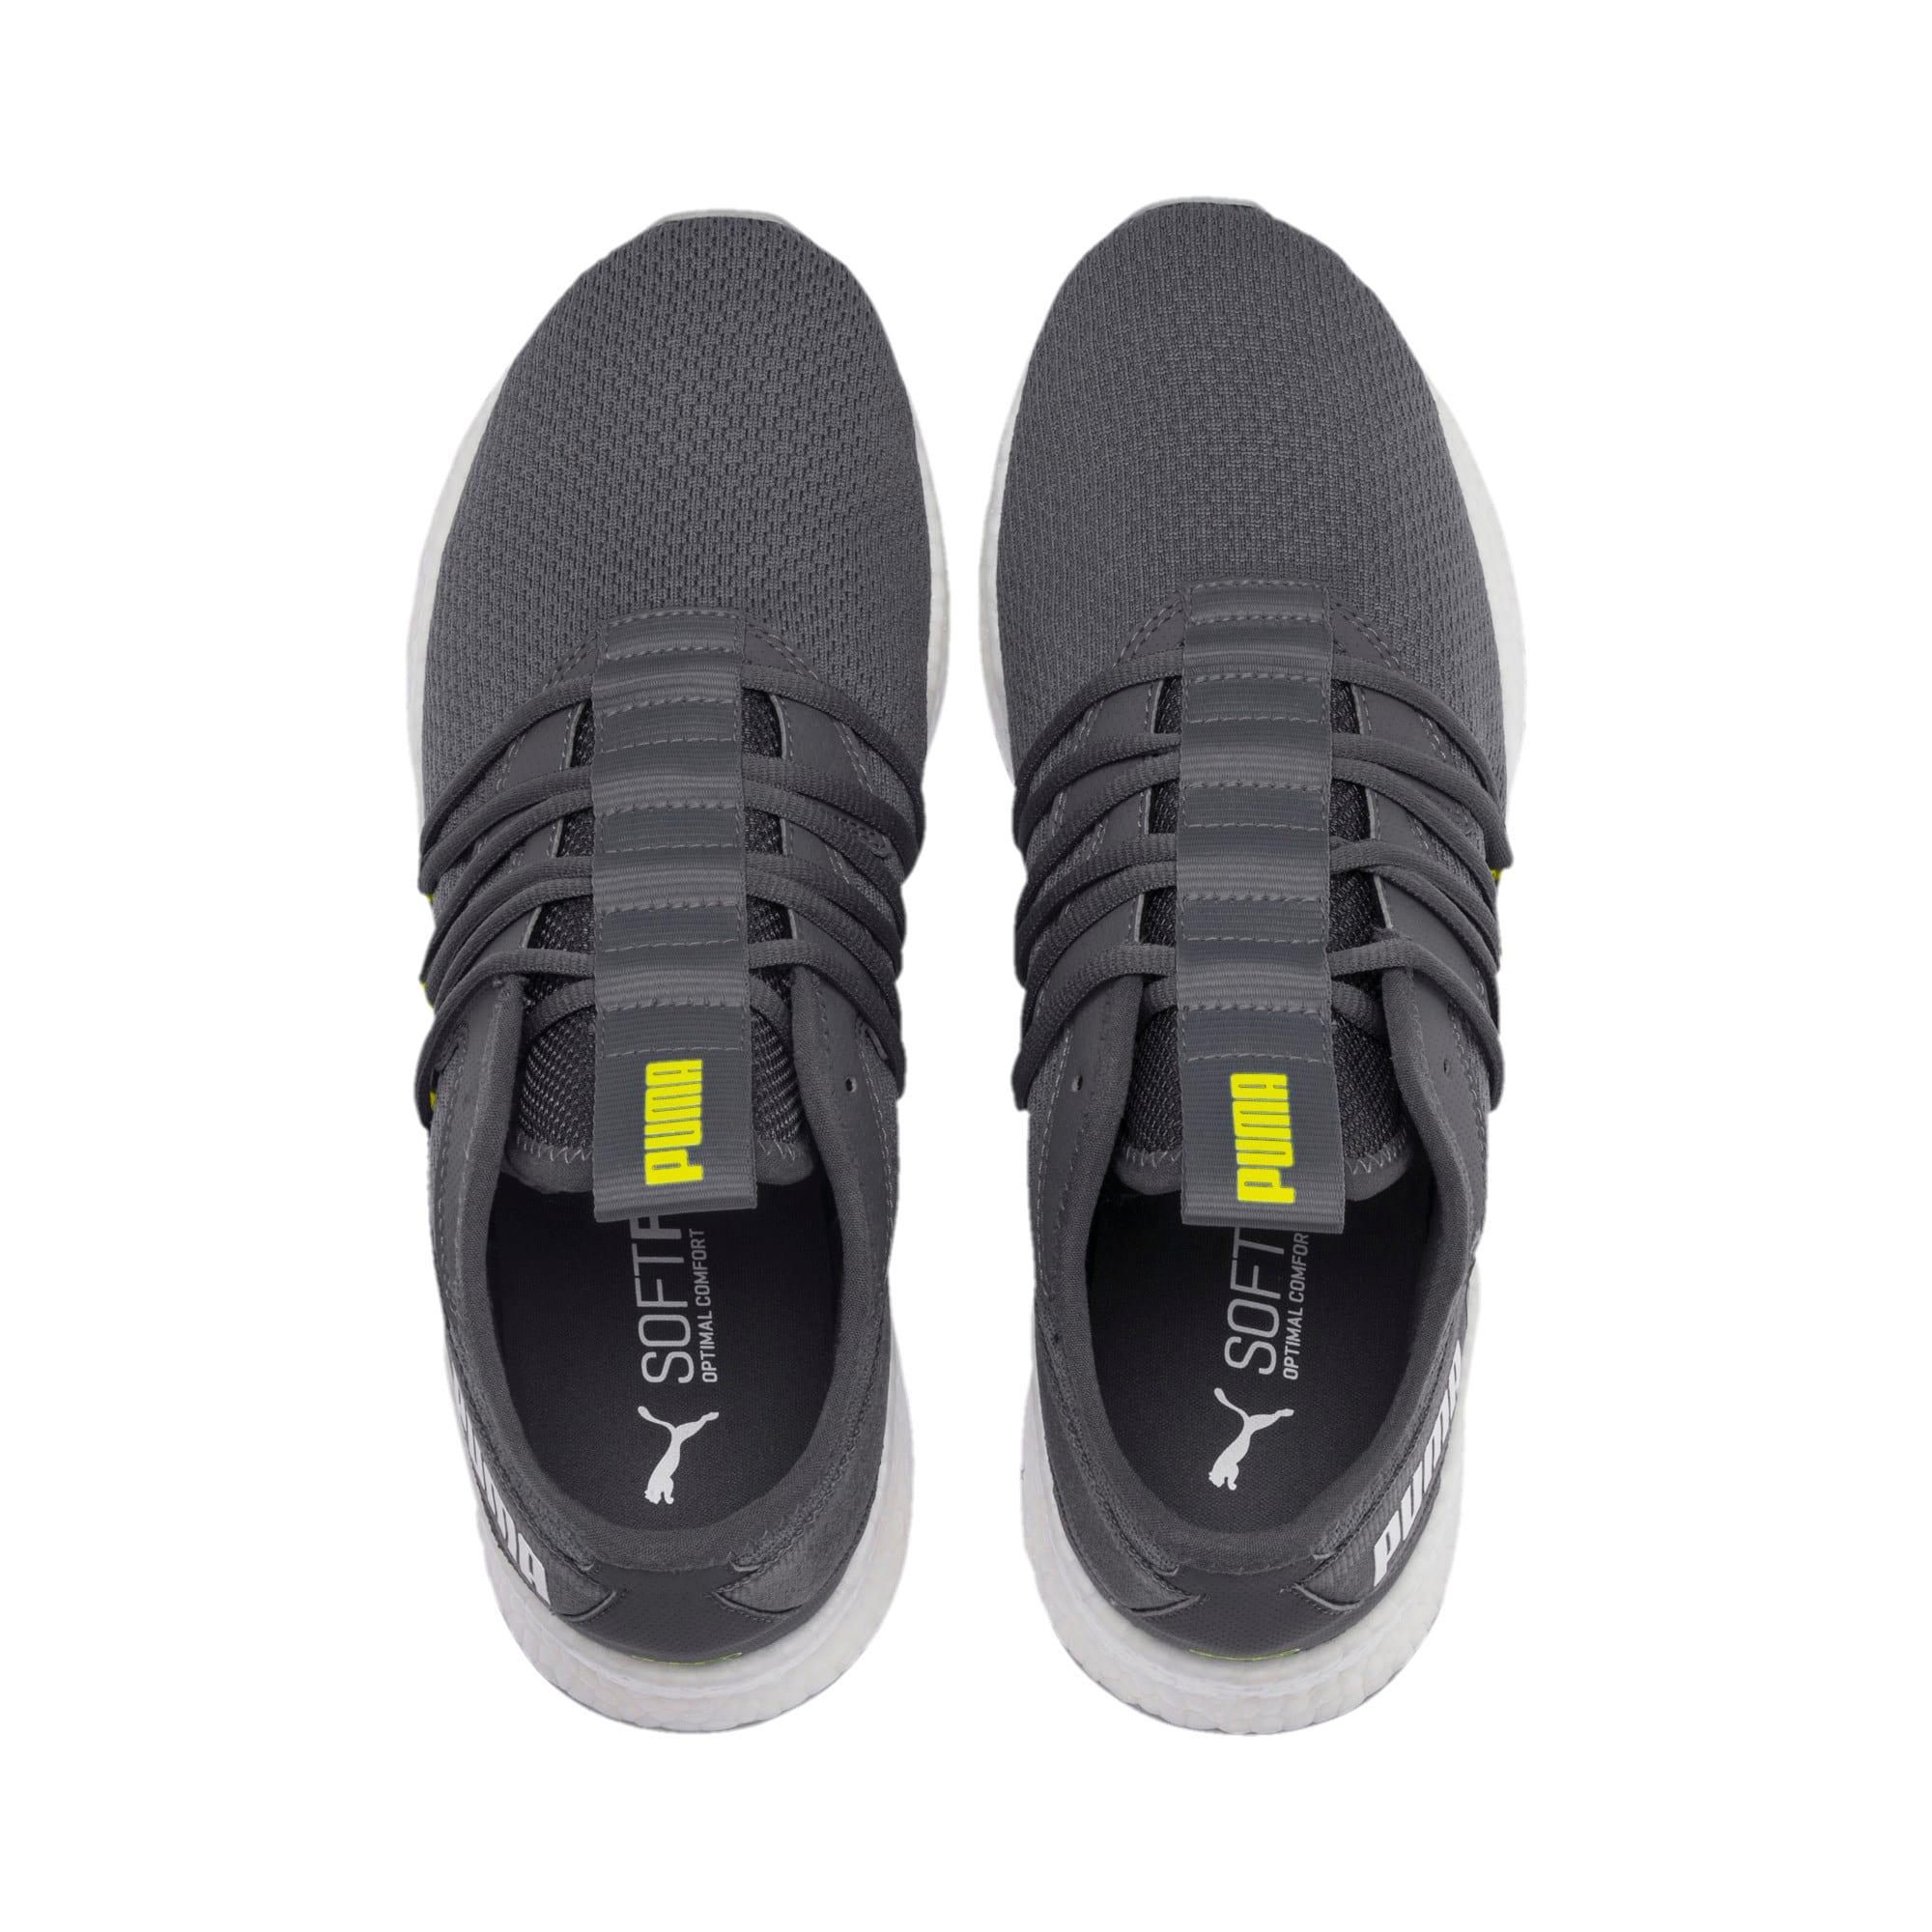 Thumbnail 7 of NRGY Star Running Shoes, CASTLEROCK-White-Yellow, medium